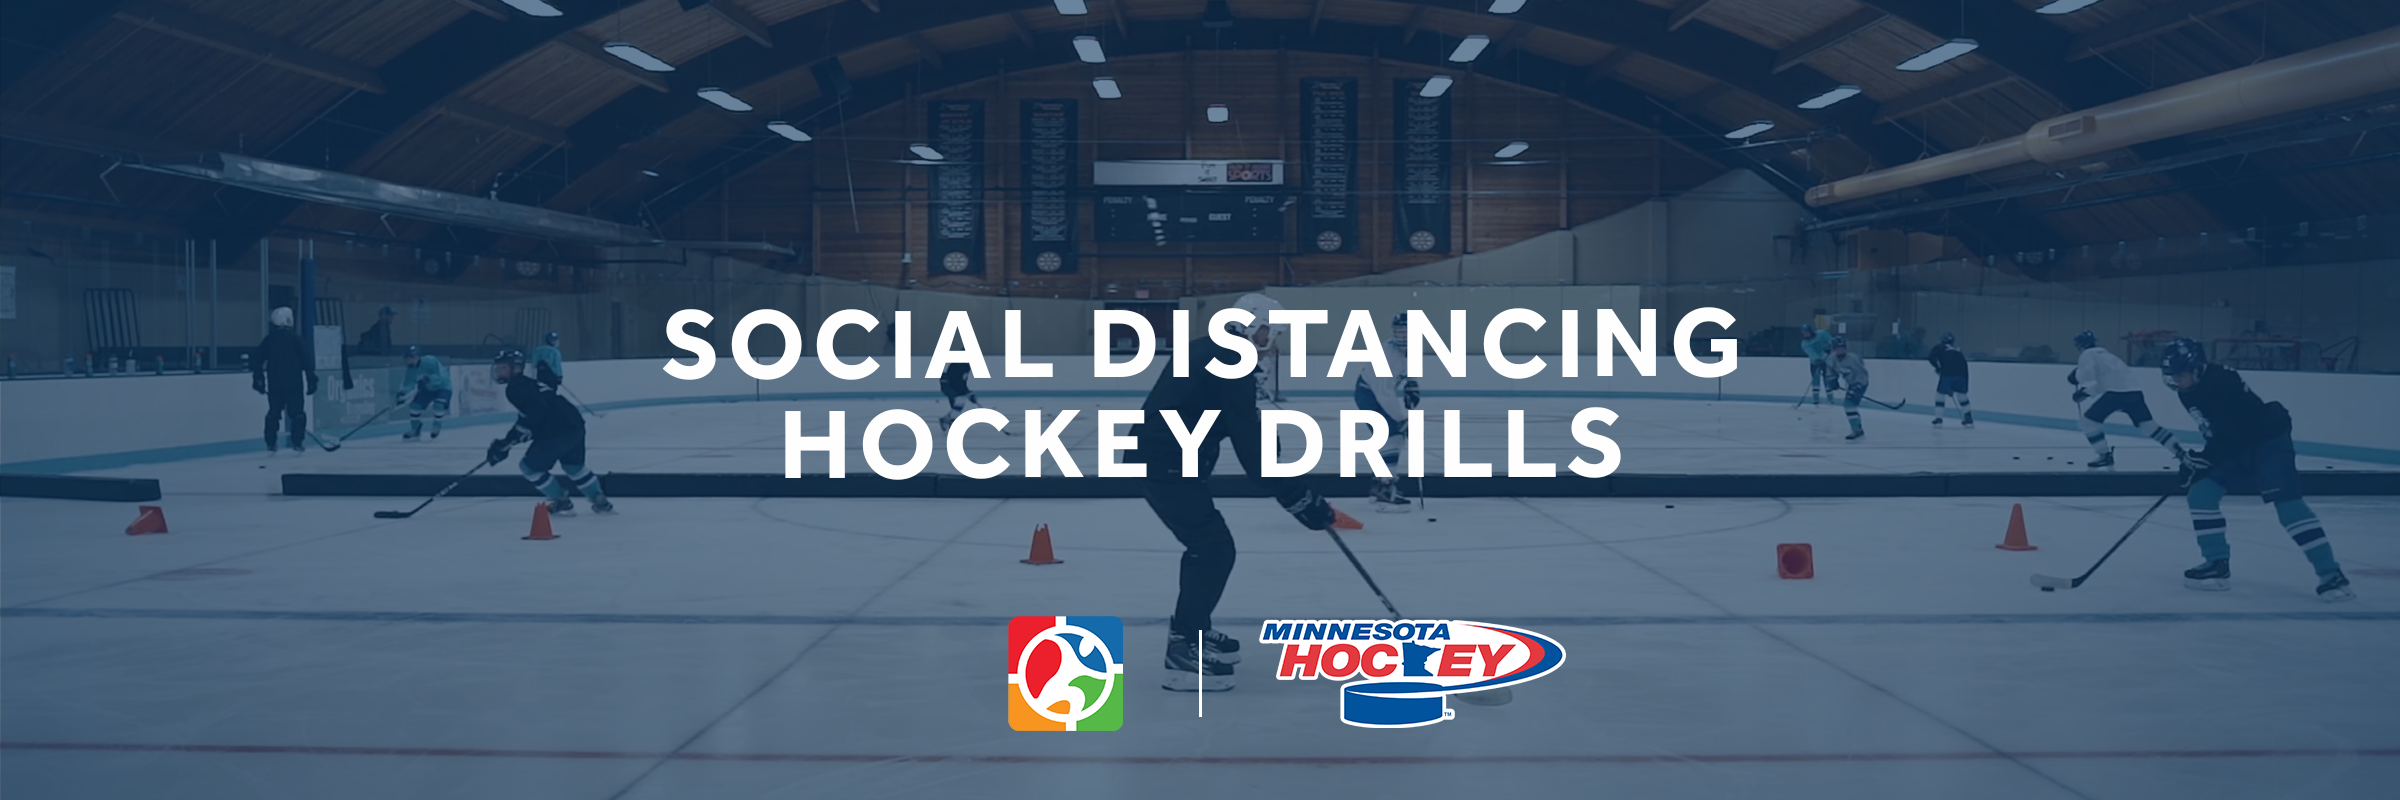 6 Social Distancing Drills from Minnesota Hockey